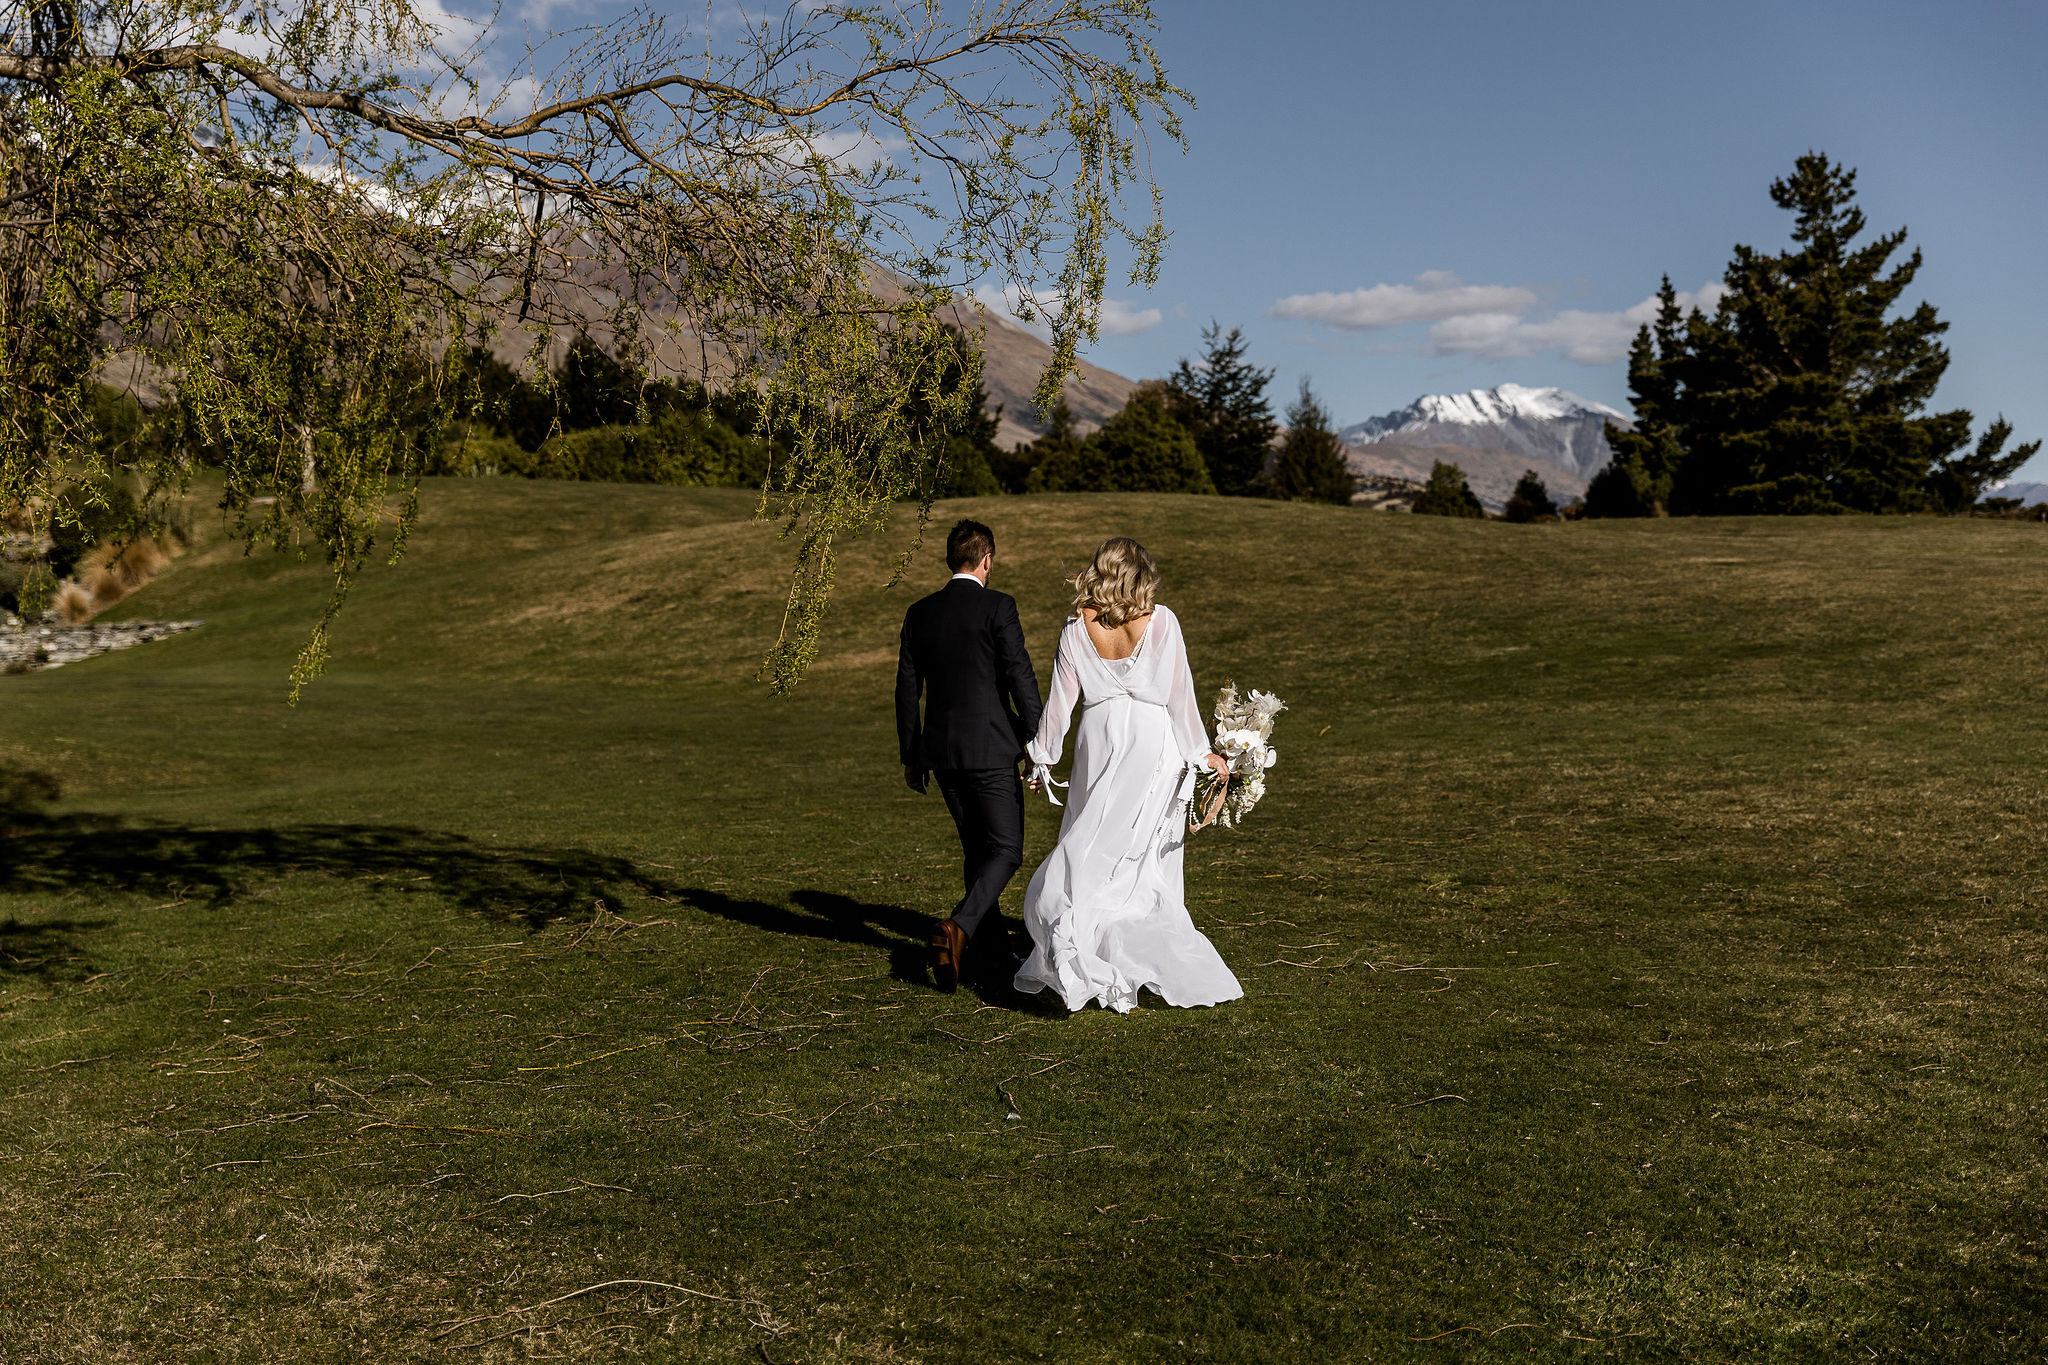 Heli Glenorchy - Blanket Bay - Wildly Romantic Weddings & Elopements